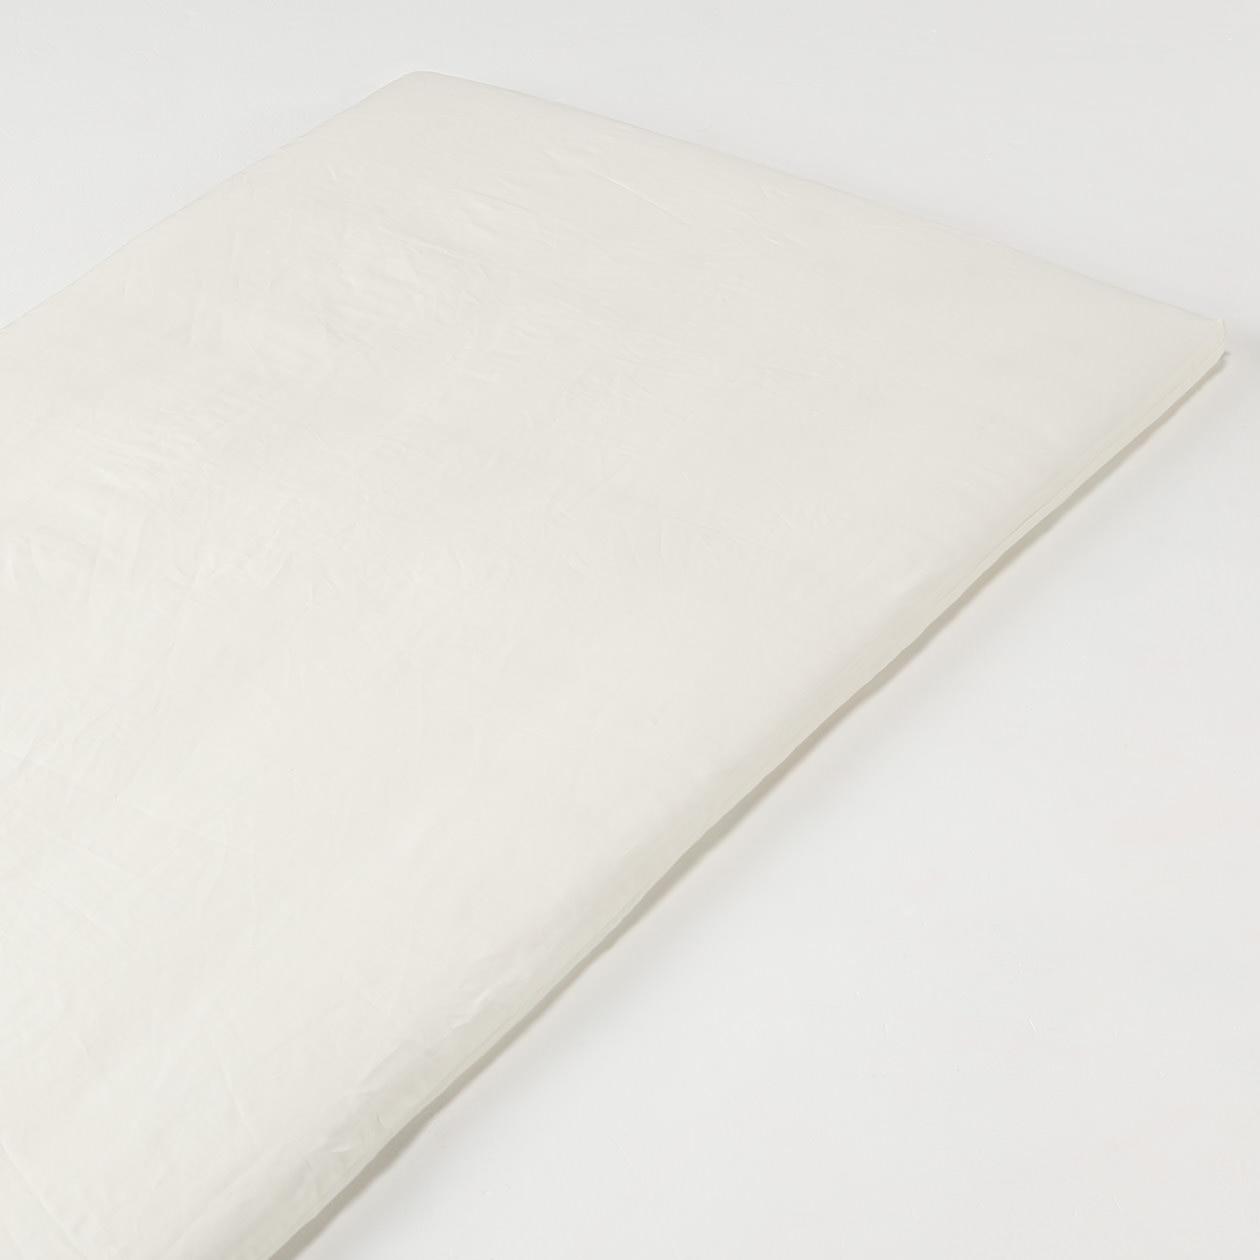 RoomClip商品情報 - 麻平織フラットシーツ・S/生成 S/オフ白